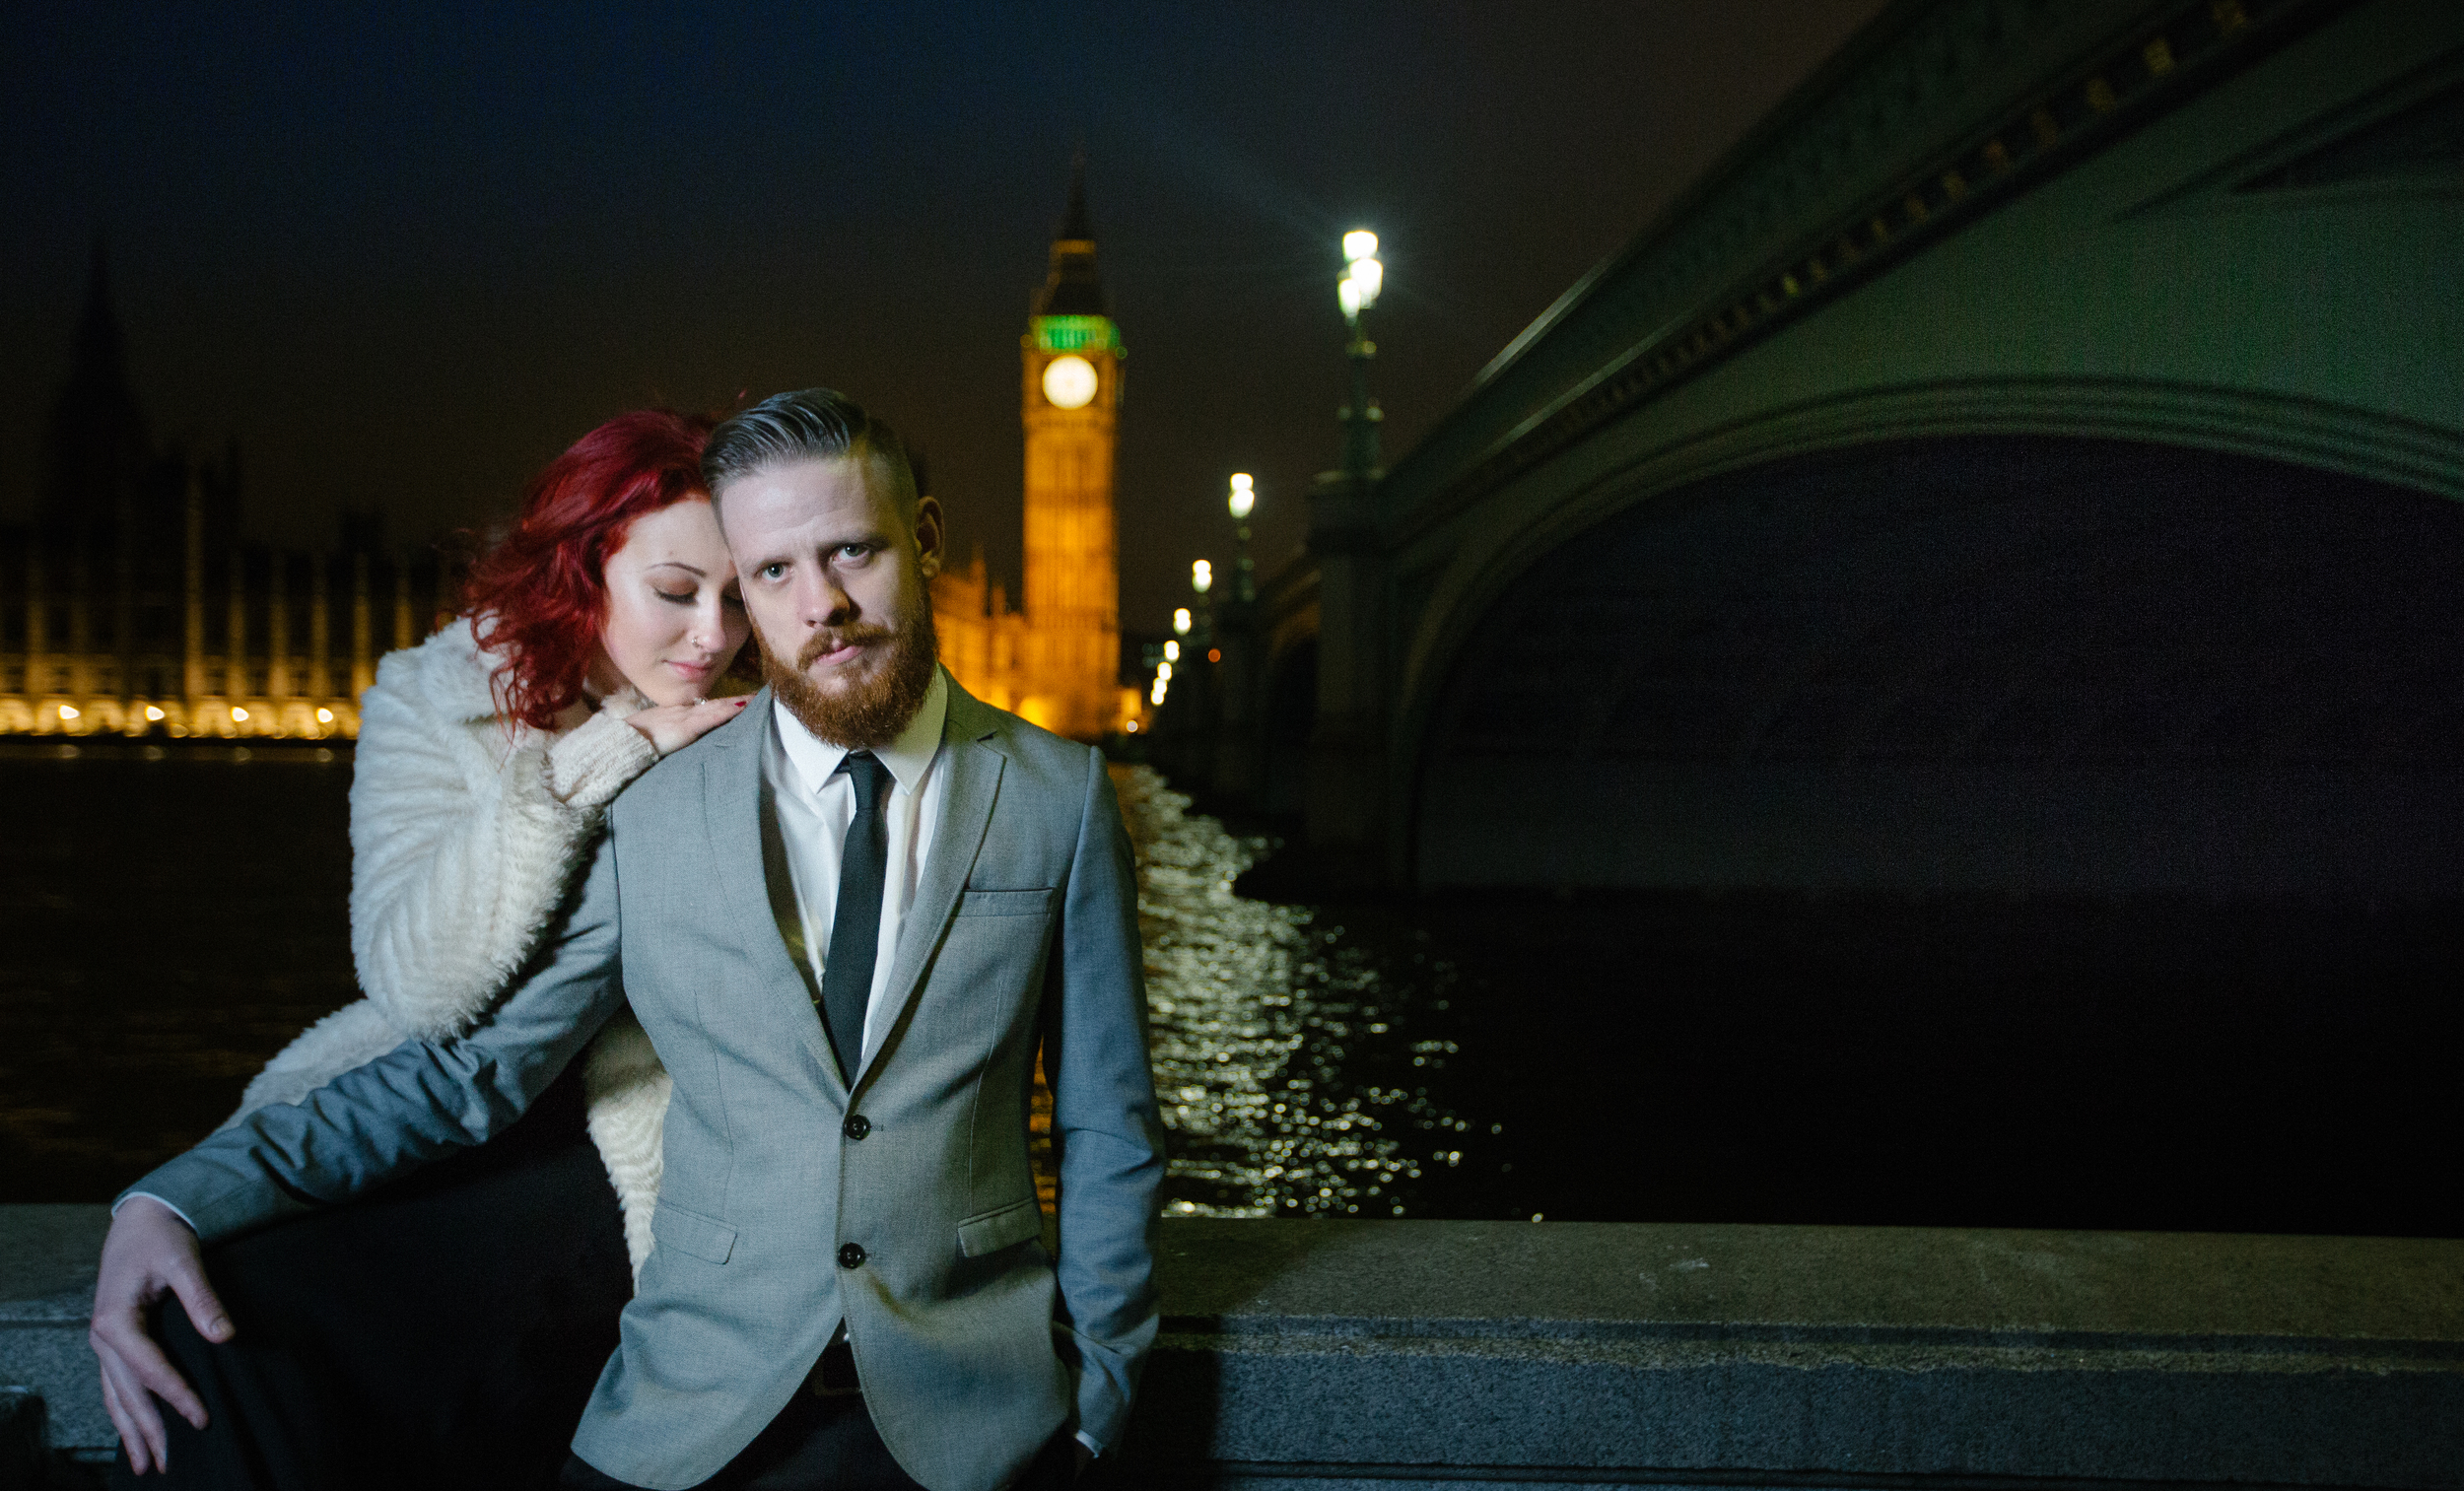 westminster-engagement-6-london-uk-destination-wedding-photography-Adam-Rowley